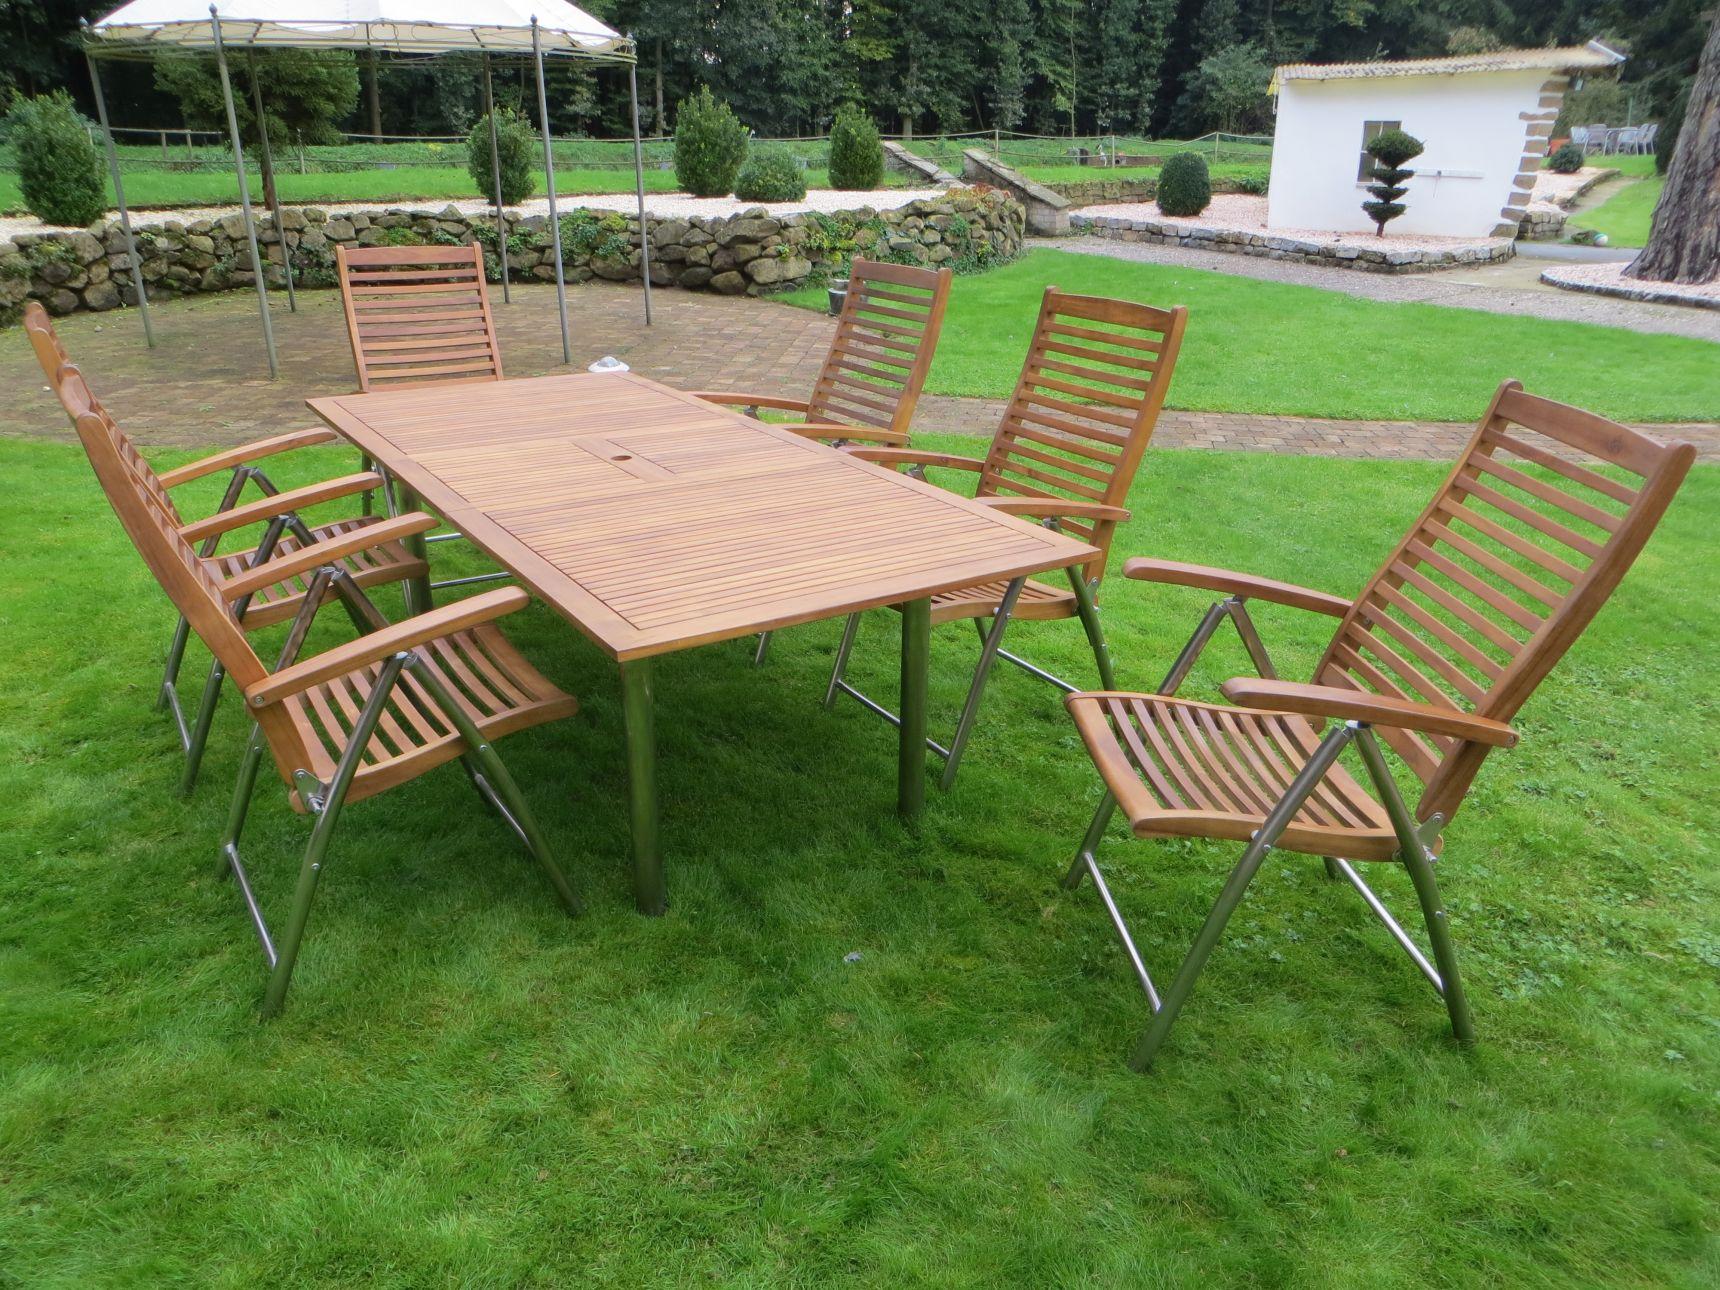 Gartenmöbel Holz Mit Edelstahl – Schoner garten